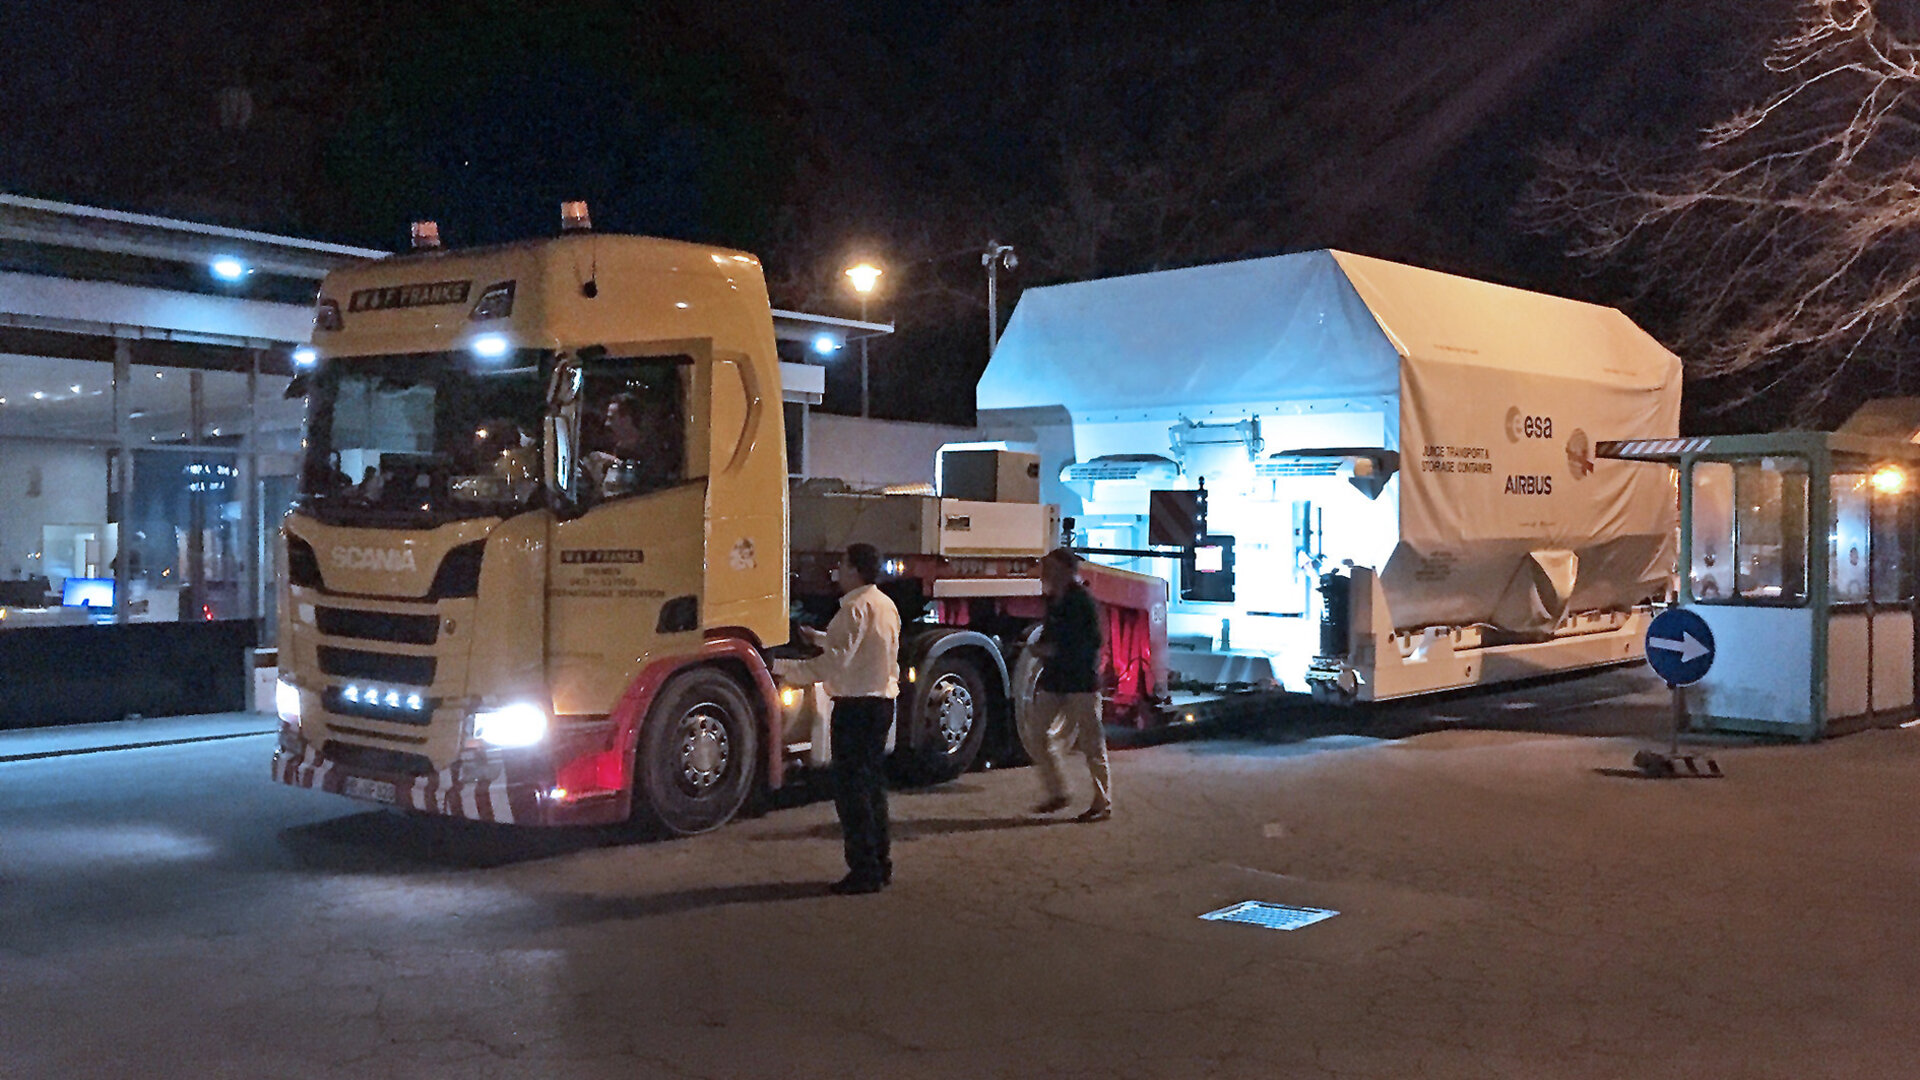 JUICE_arrives_at_Airbus_facilities_in_Friedrichshafen_Germany_1.jpg